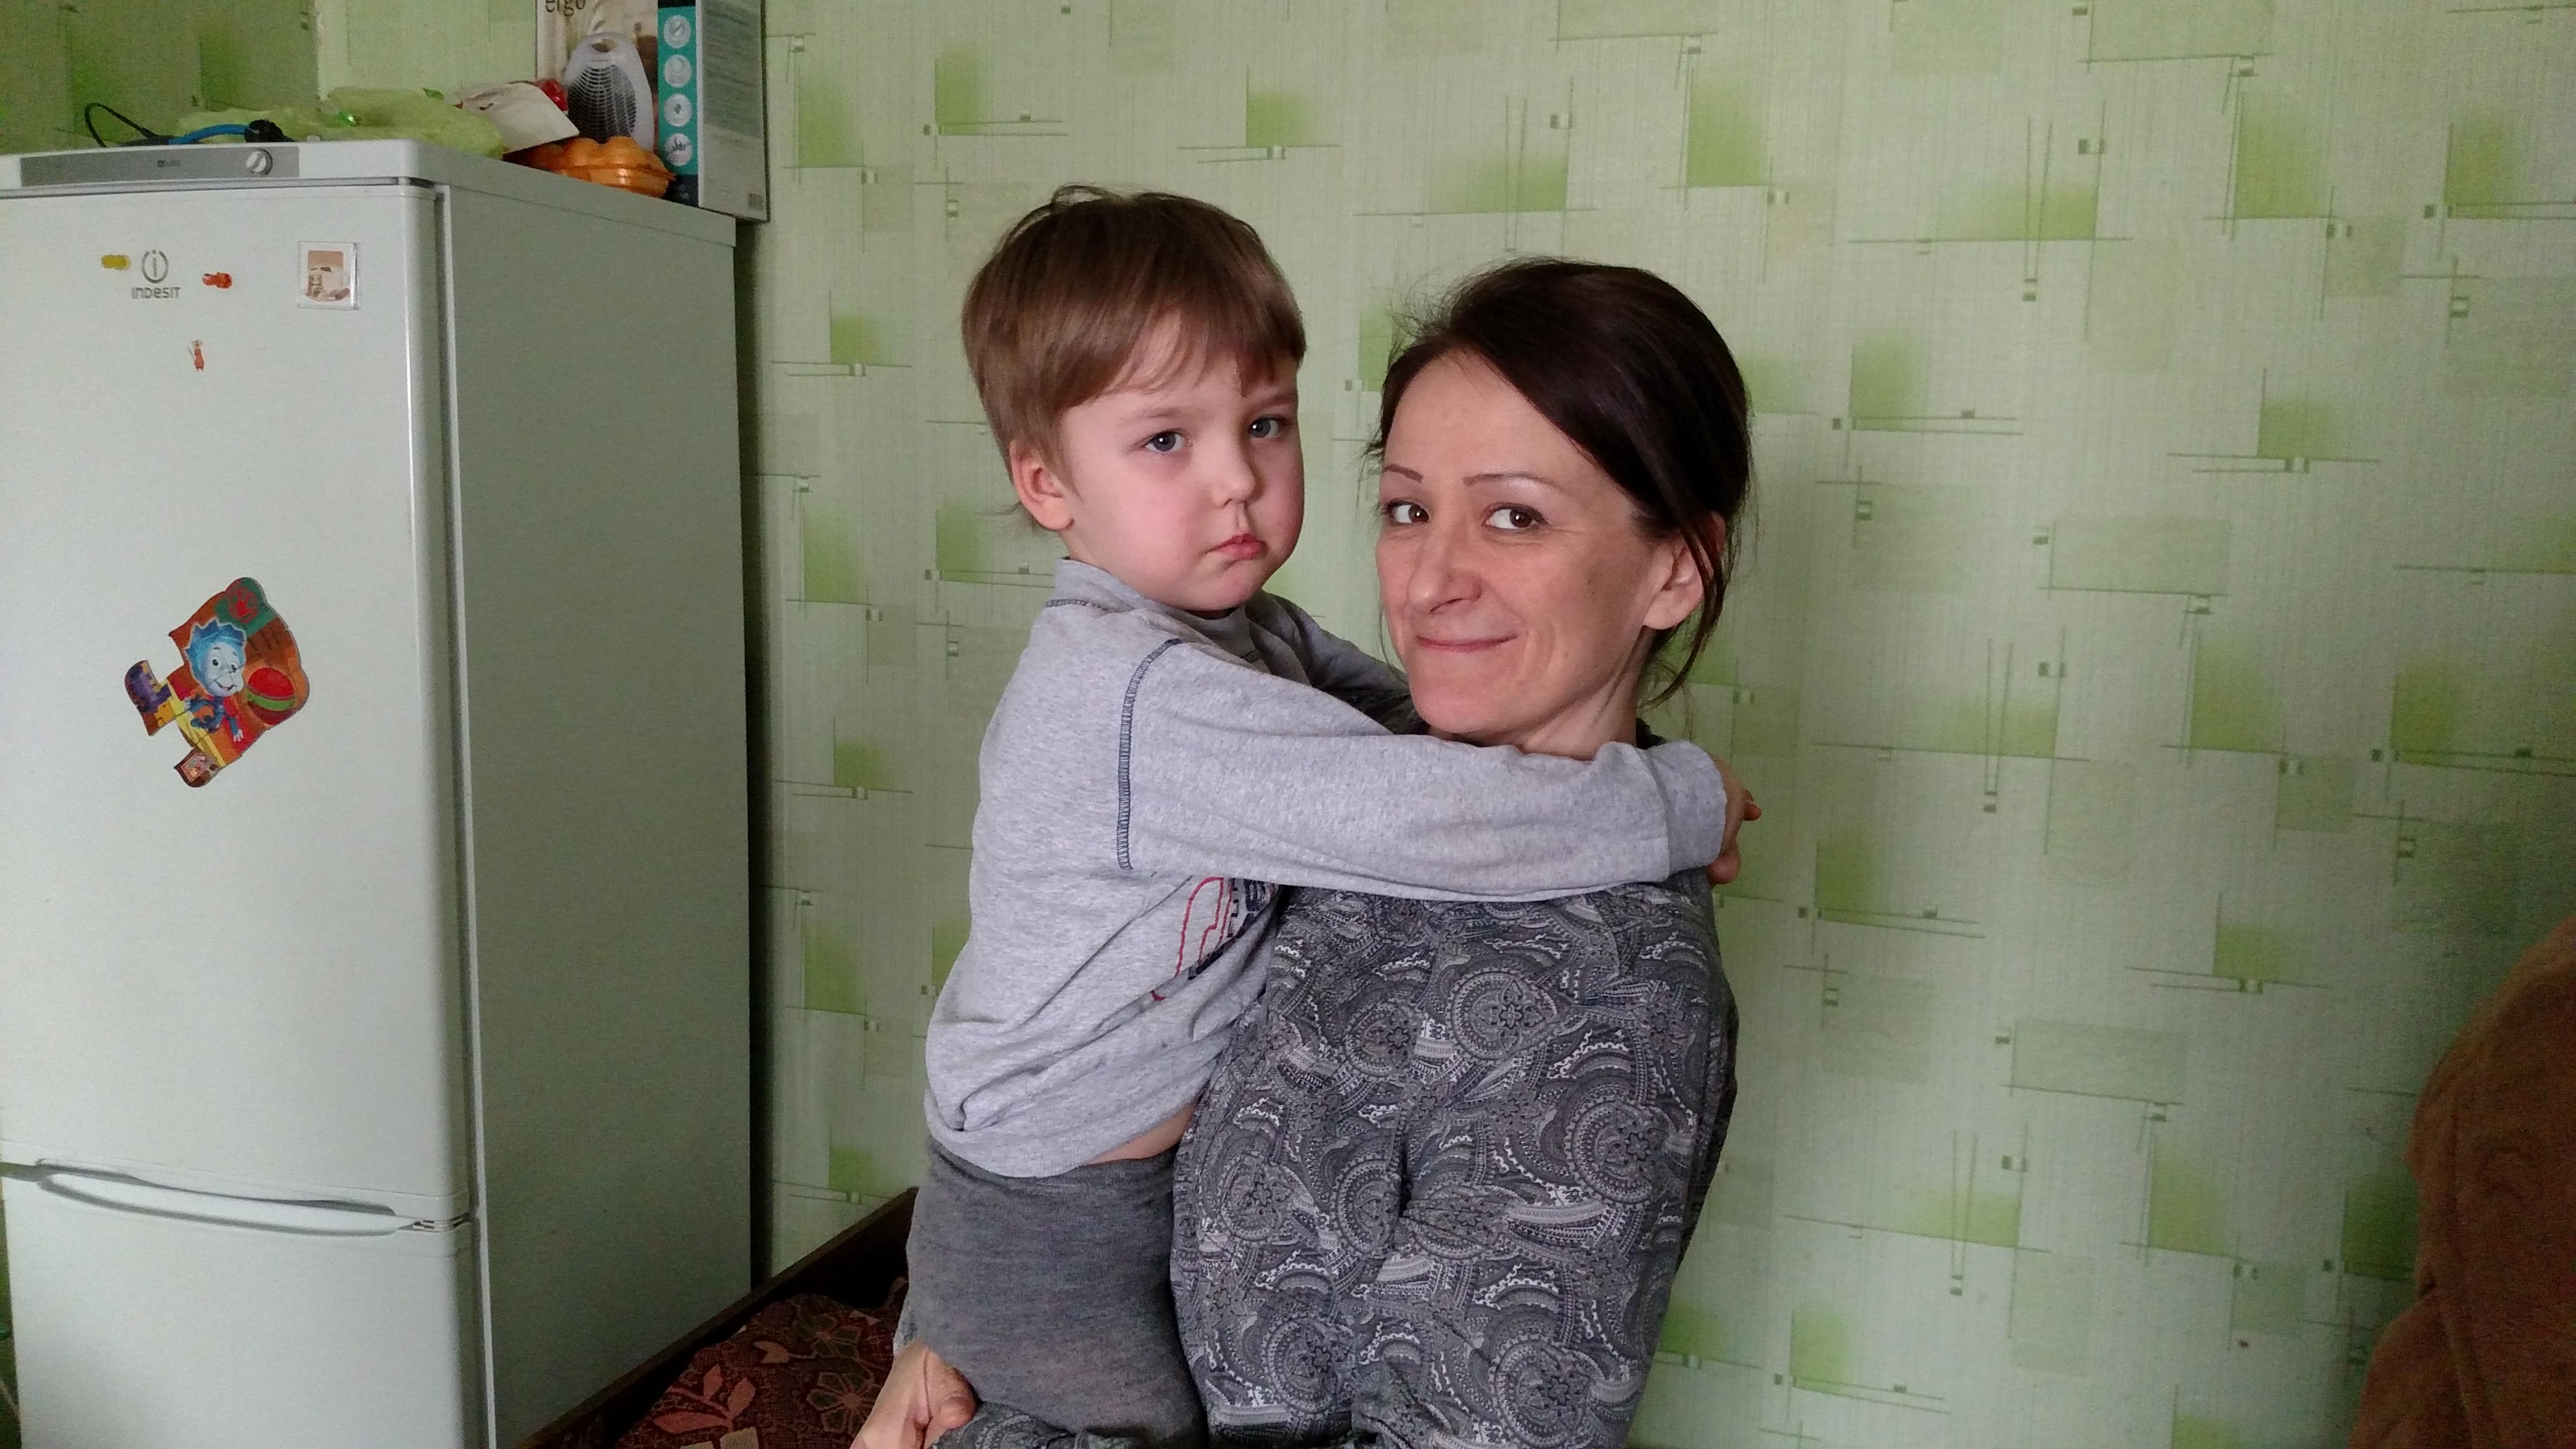 Despite Ukraine crisis, God changes lives